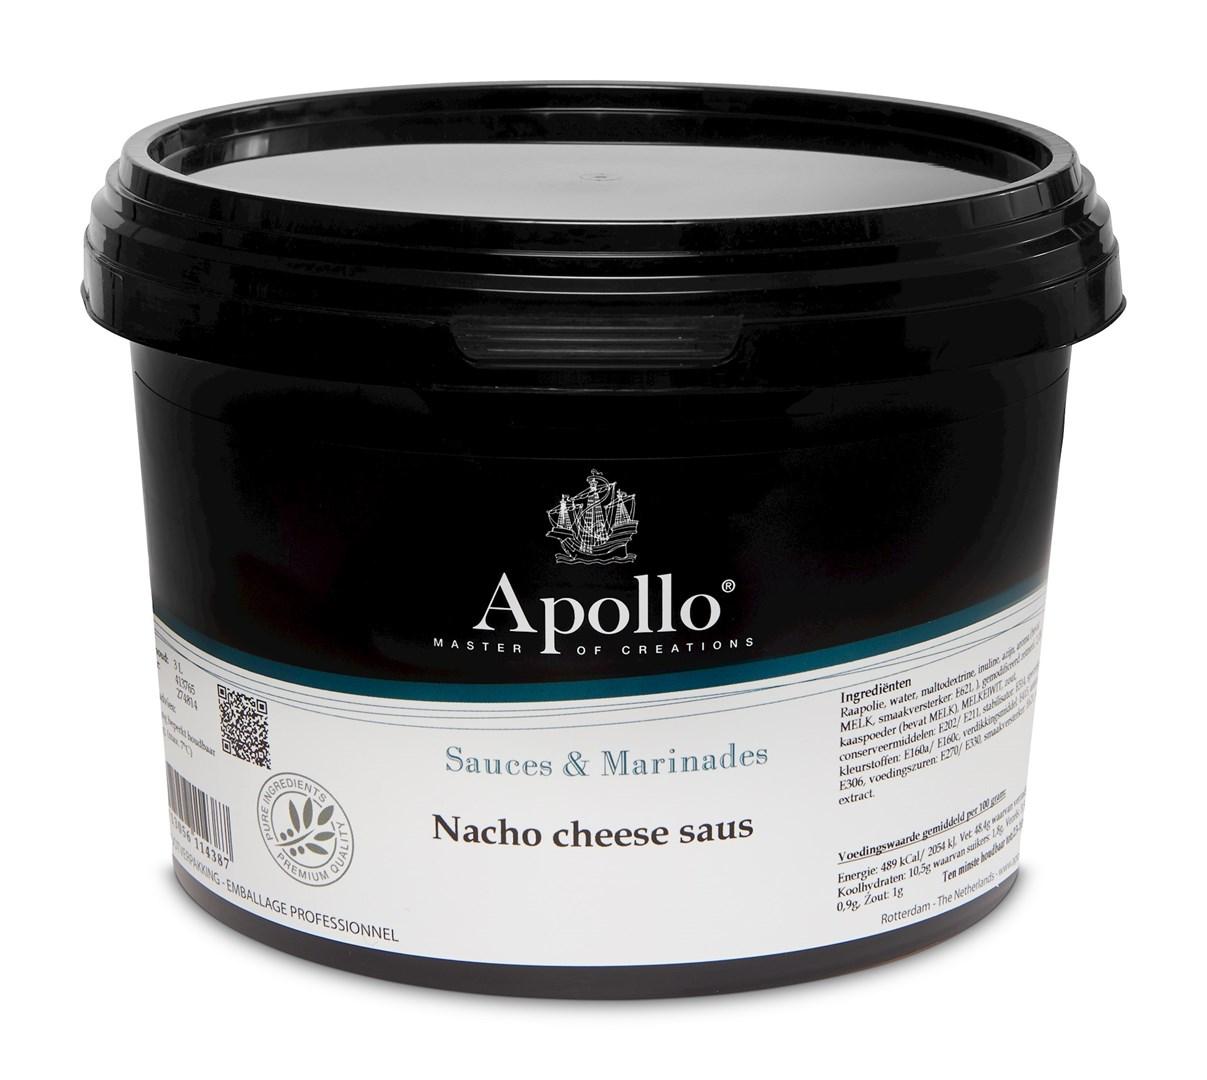 Productafbeelding Nacho cheese saus a 4,5 kg